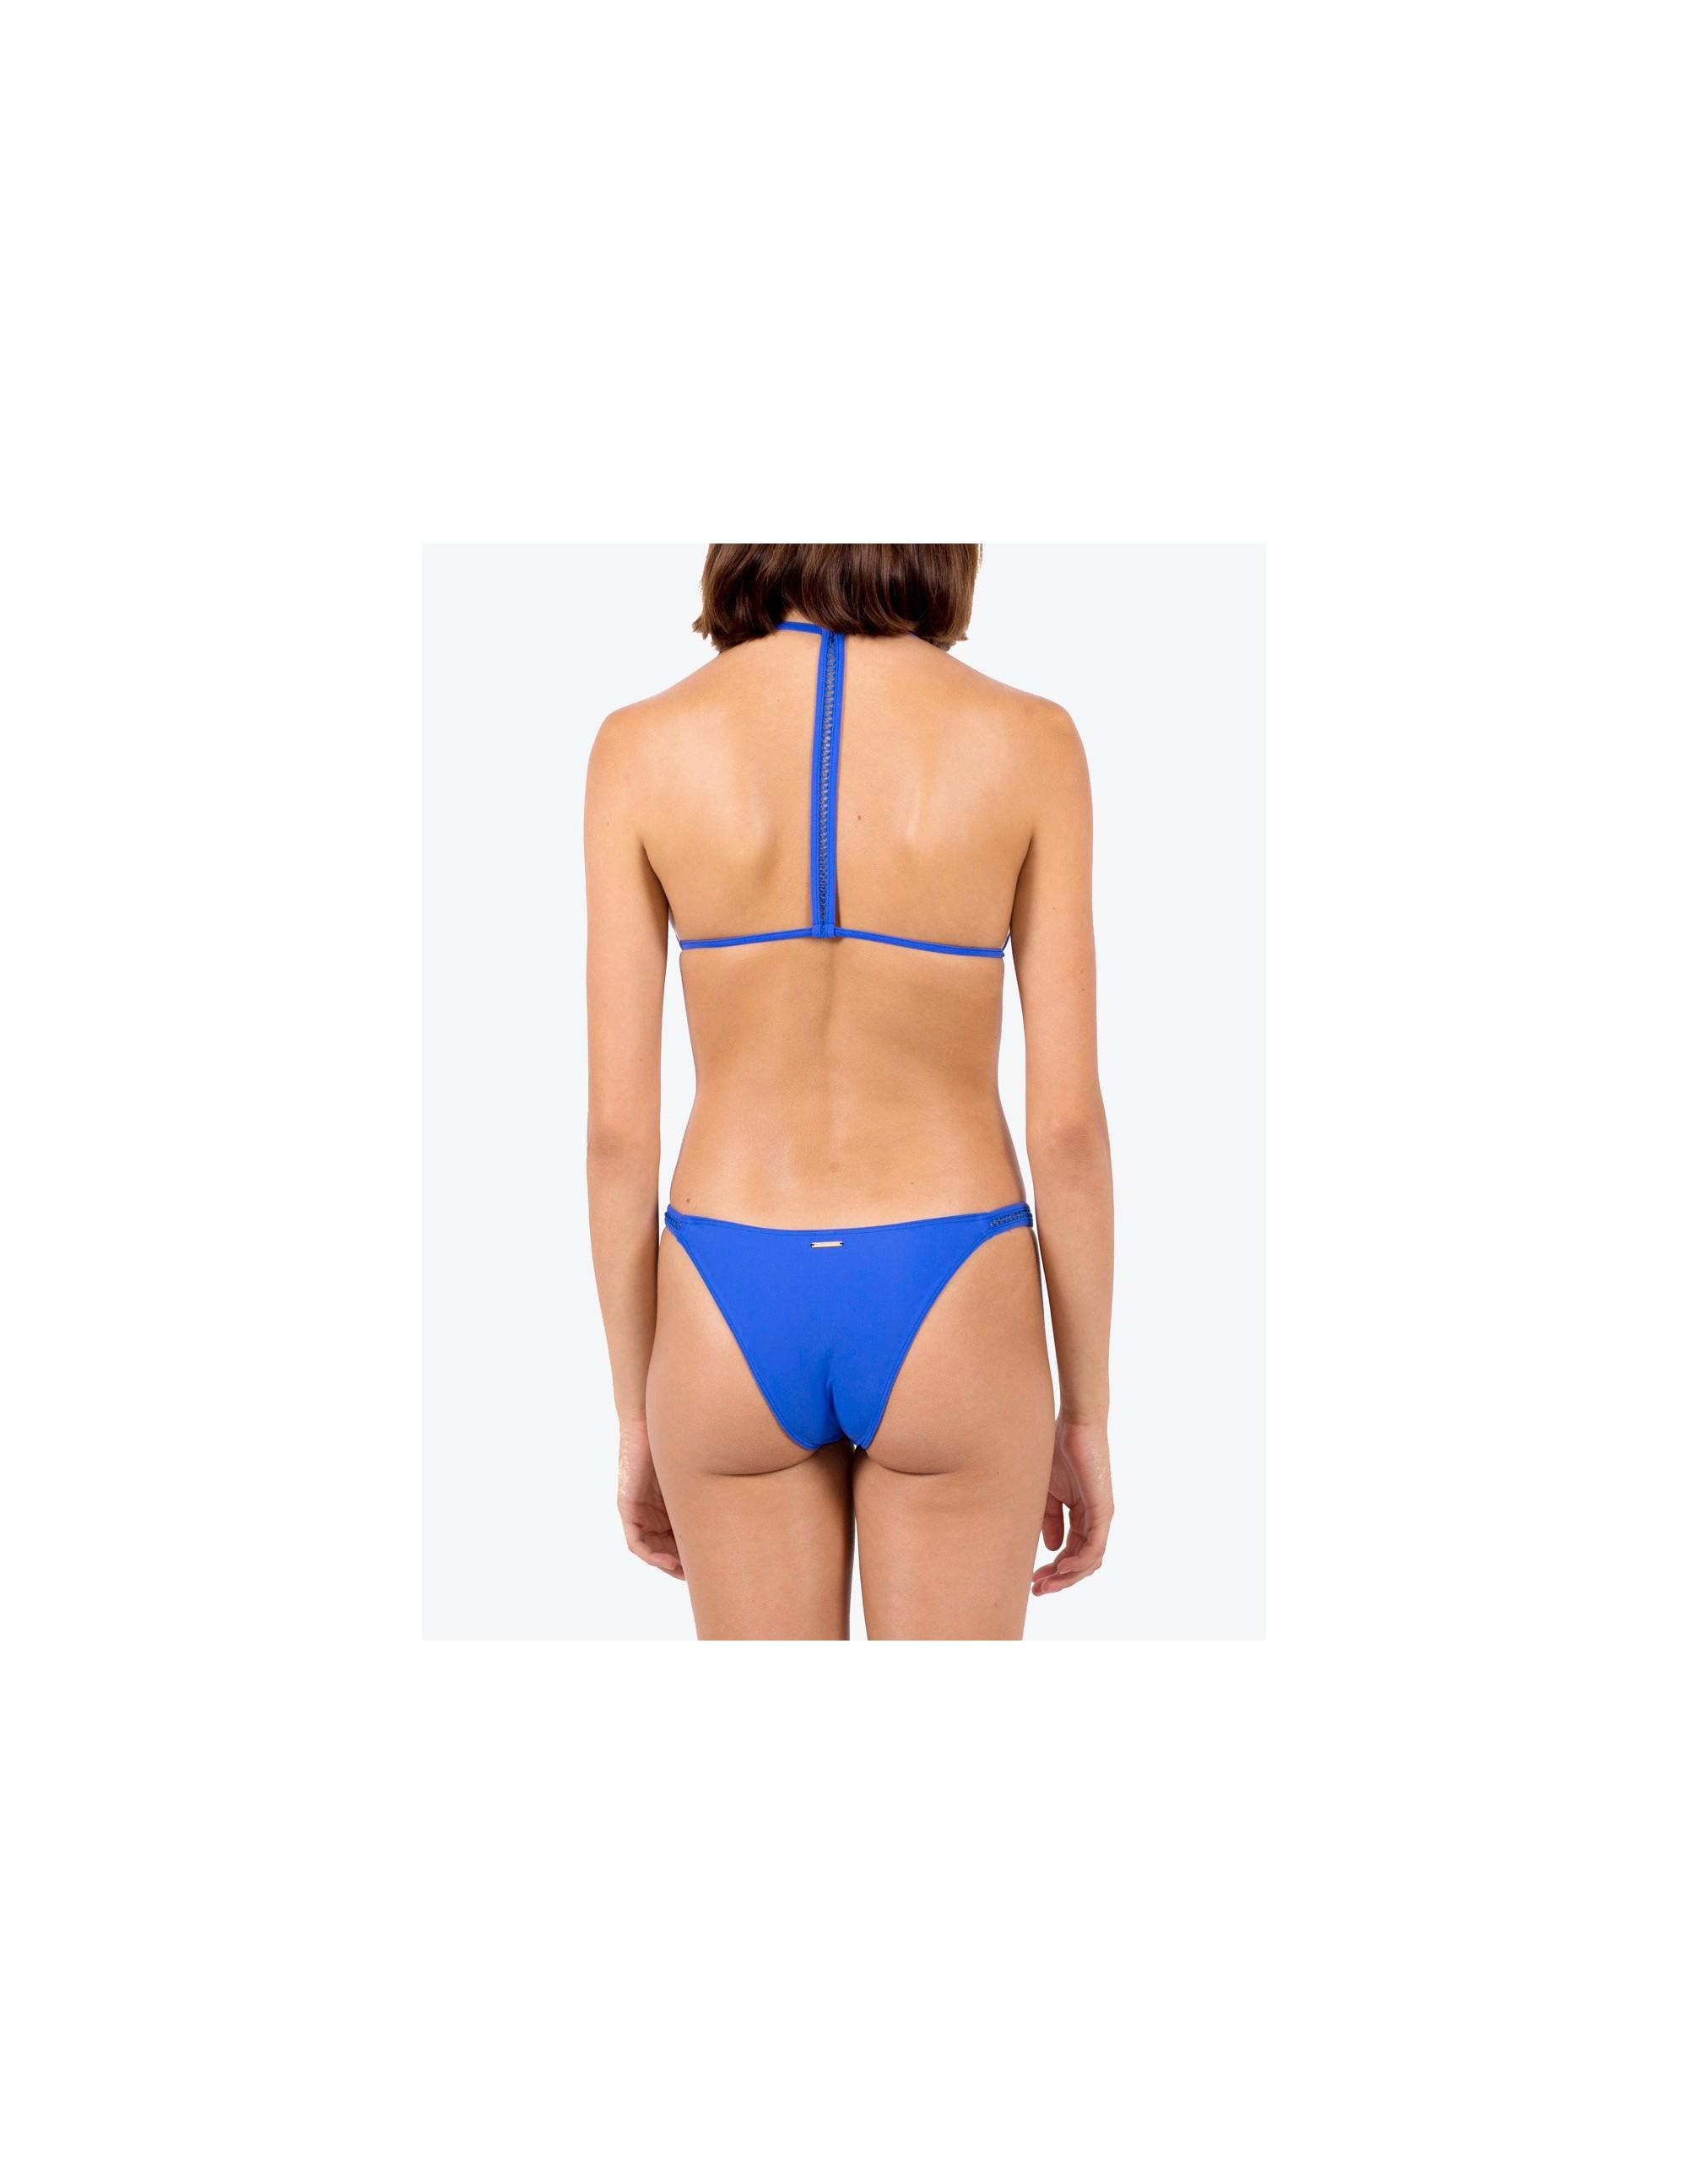 ANAMUR bikini top - ECHO BLUE